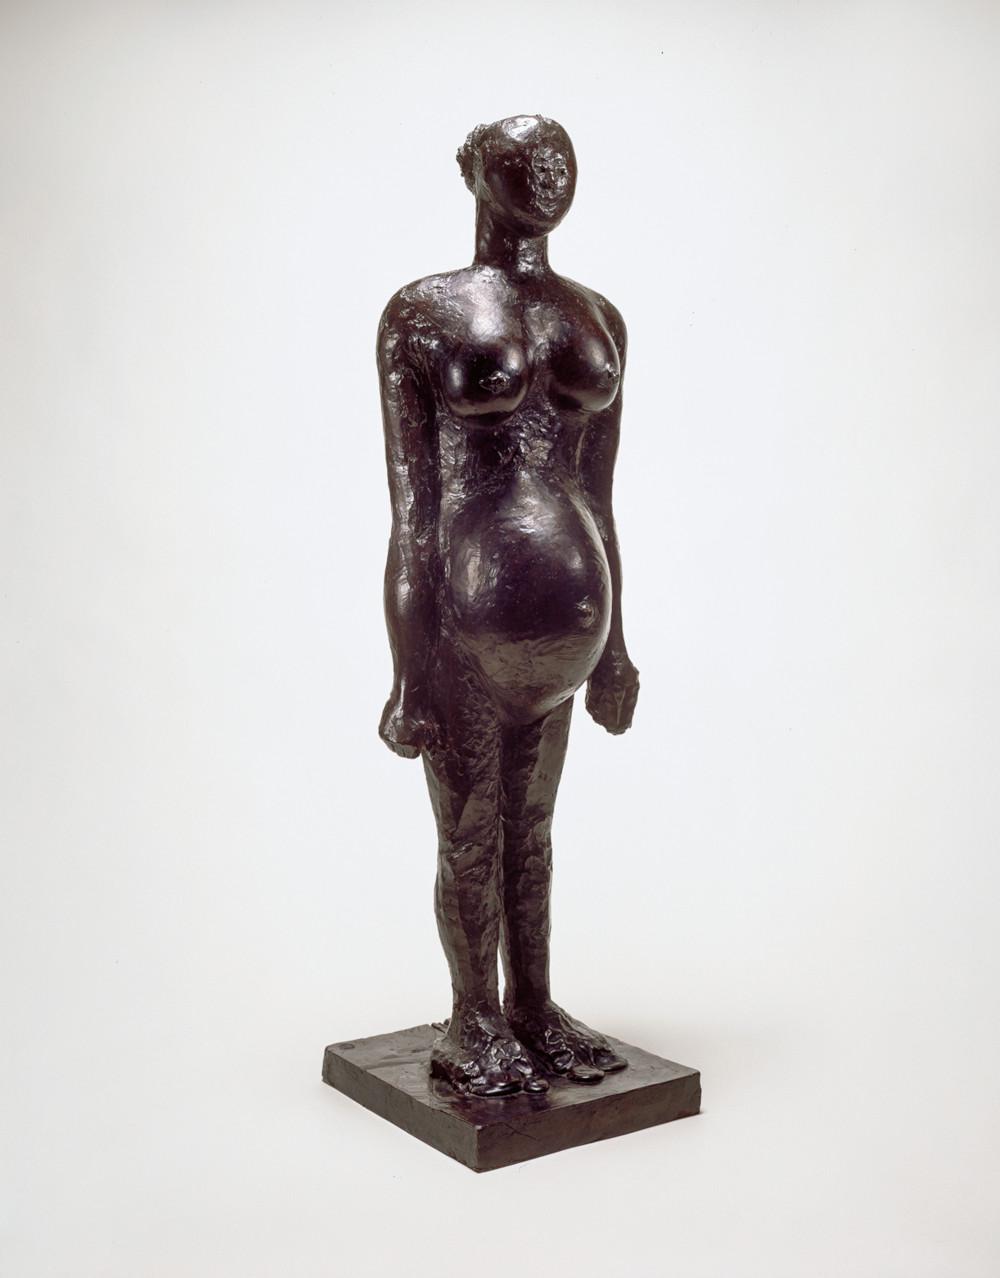 Pablo Picasso, La femme enceinte, 1950-59. Bronze 108.6 x 28.9 x 33.7 cm / 42 3/4 x 11 3/8 x 13 1/4 in. Raymond and Patsy Nasher Collection, Nasher Sculpture Center, Dallas © Succession Picasso / 2019, ProLitteris, Zurich. Photo: David Heald